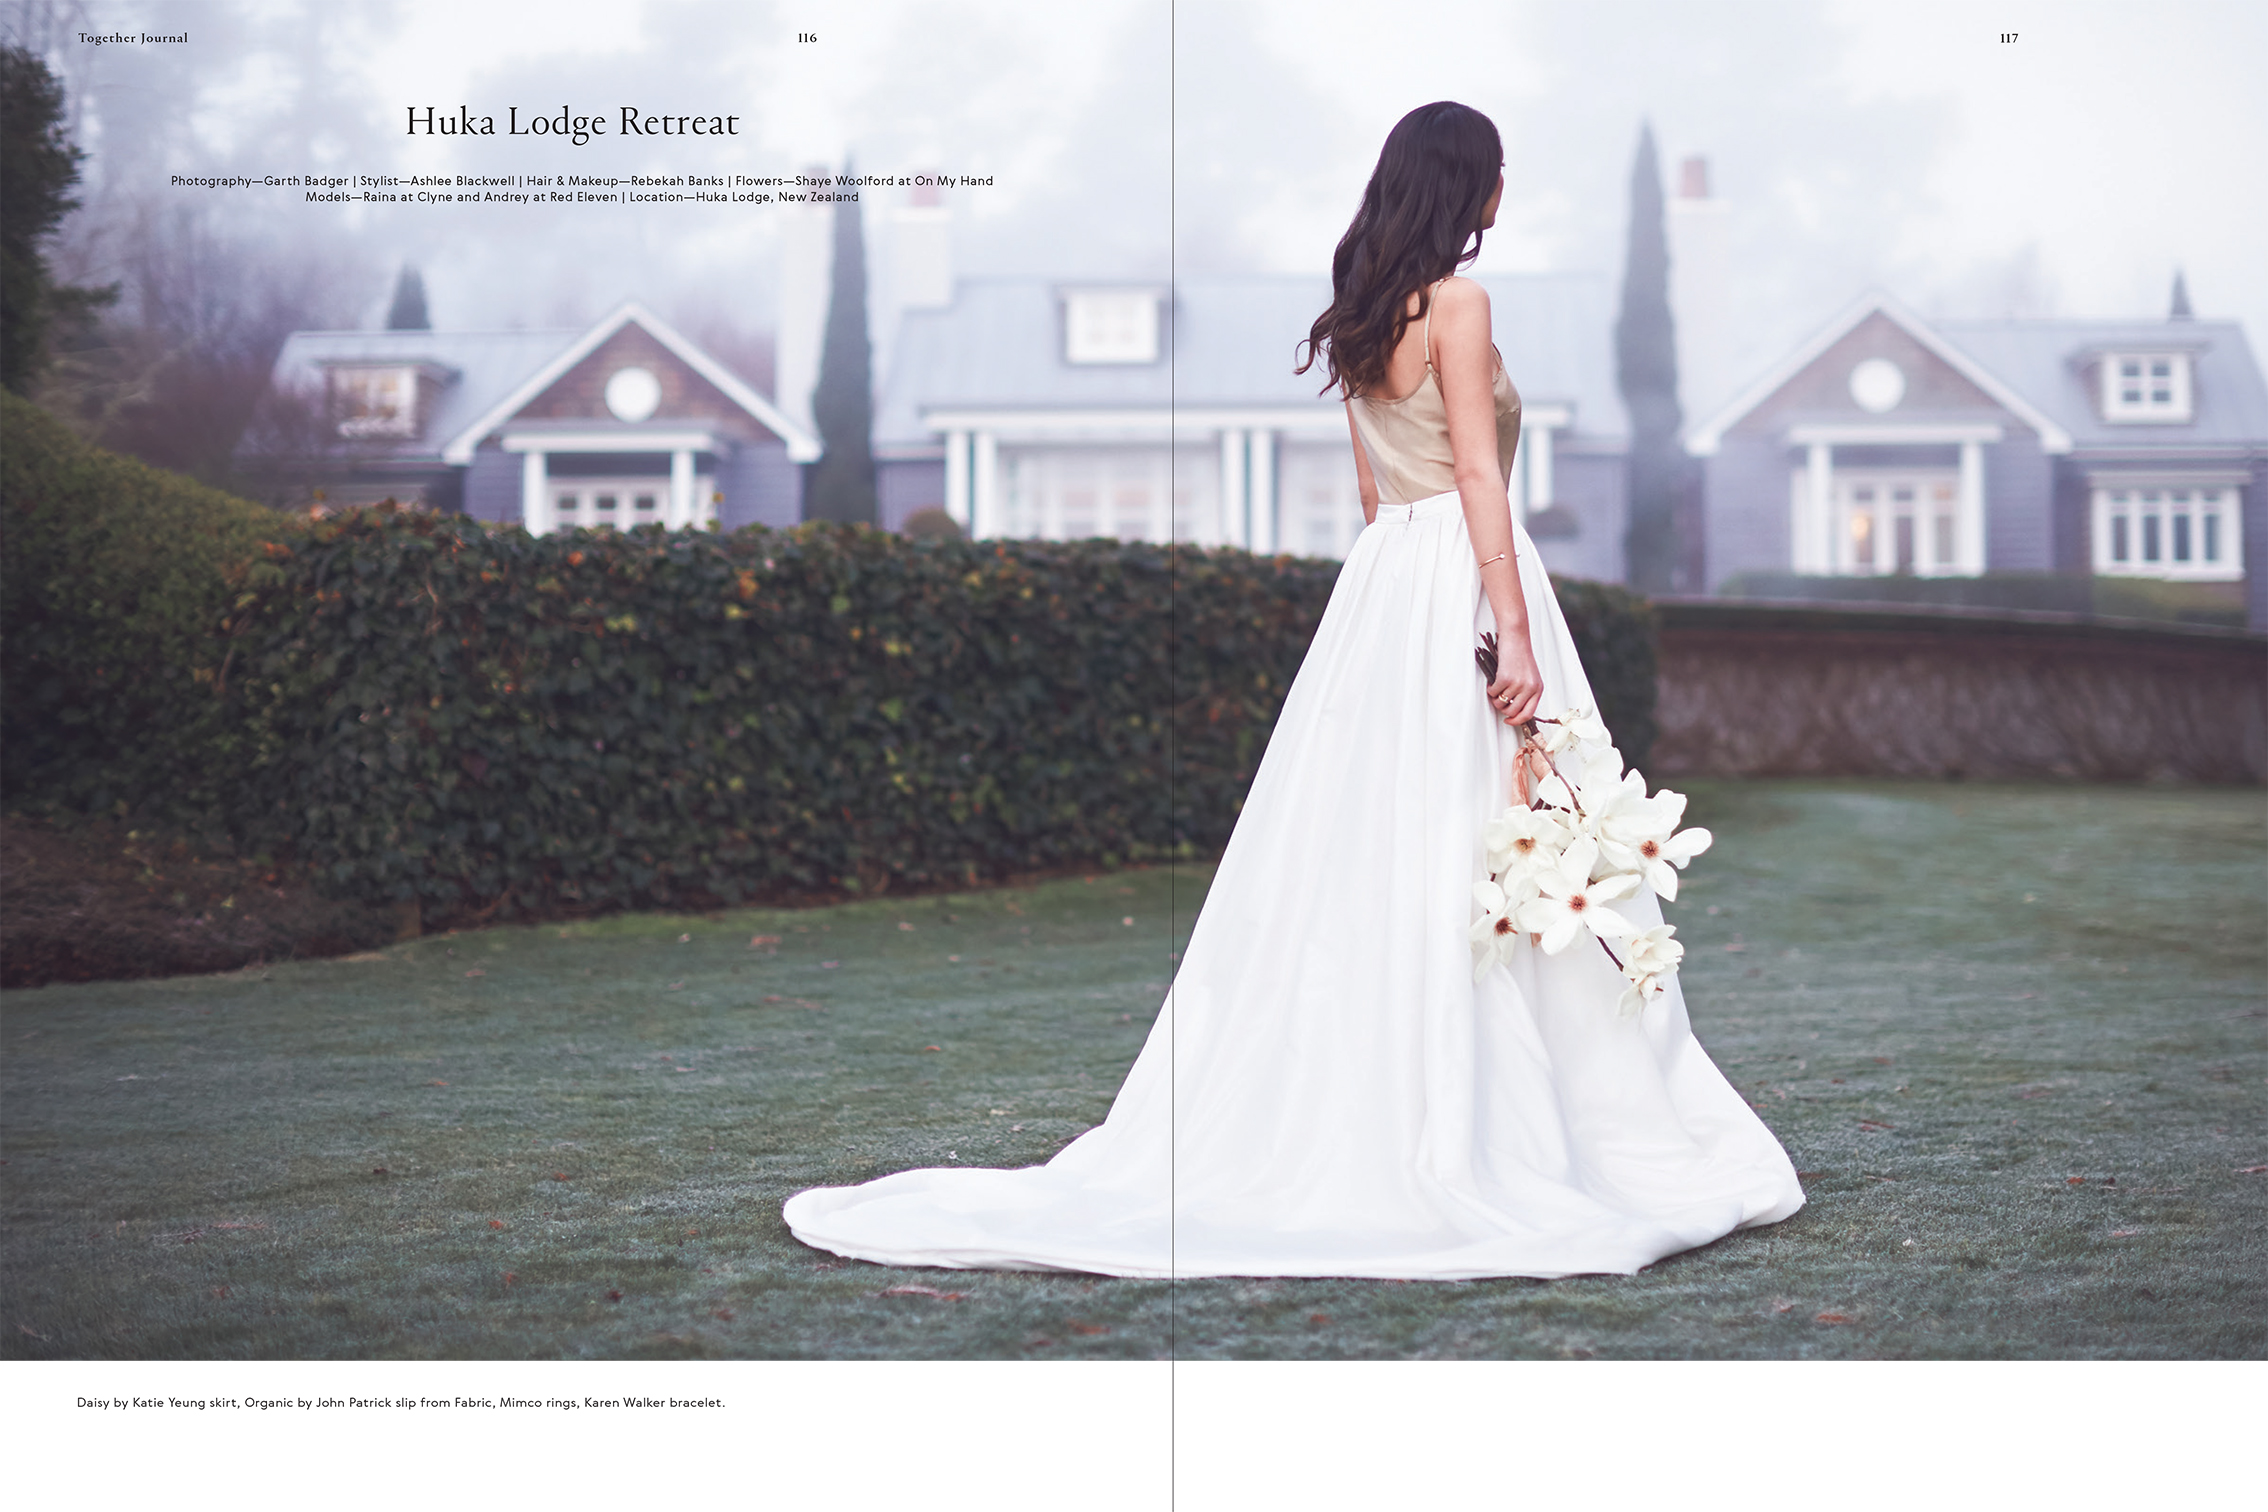 Categories: Fashion-Huka Lodge Retreat - Fashion Issue 5